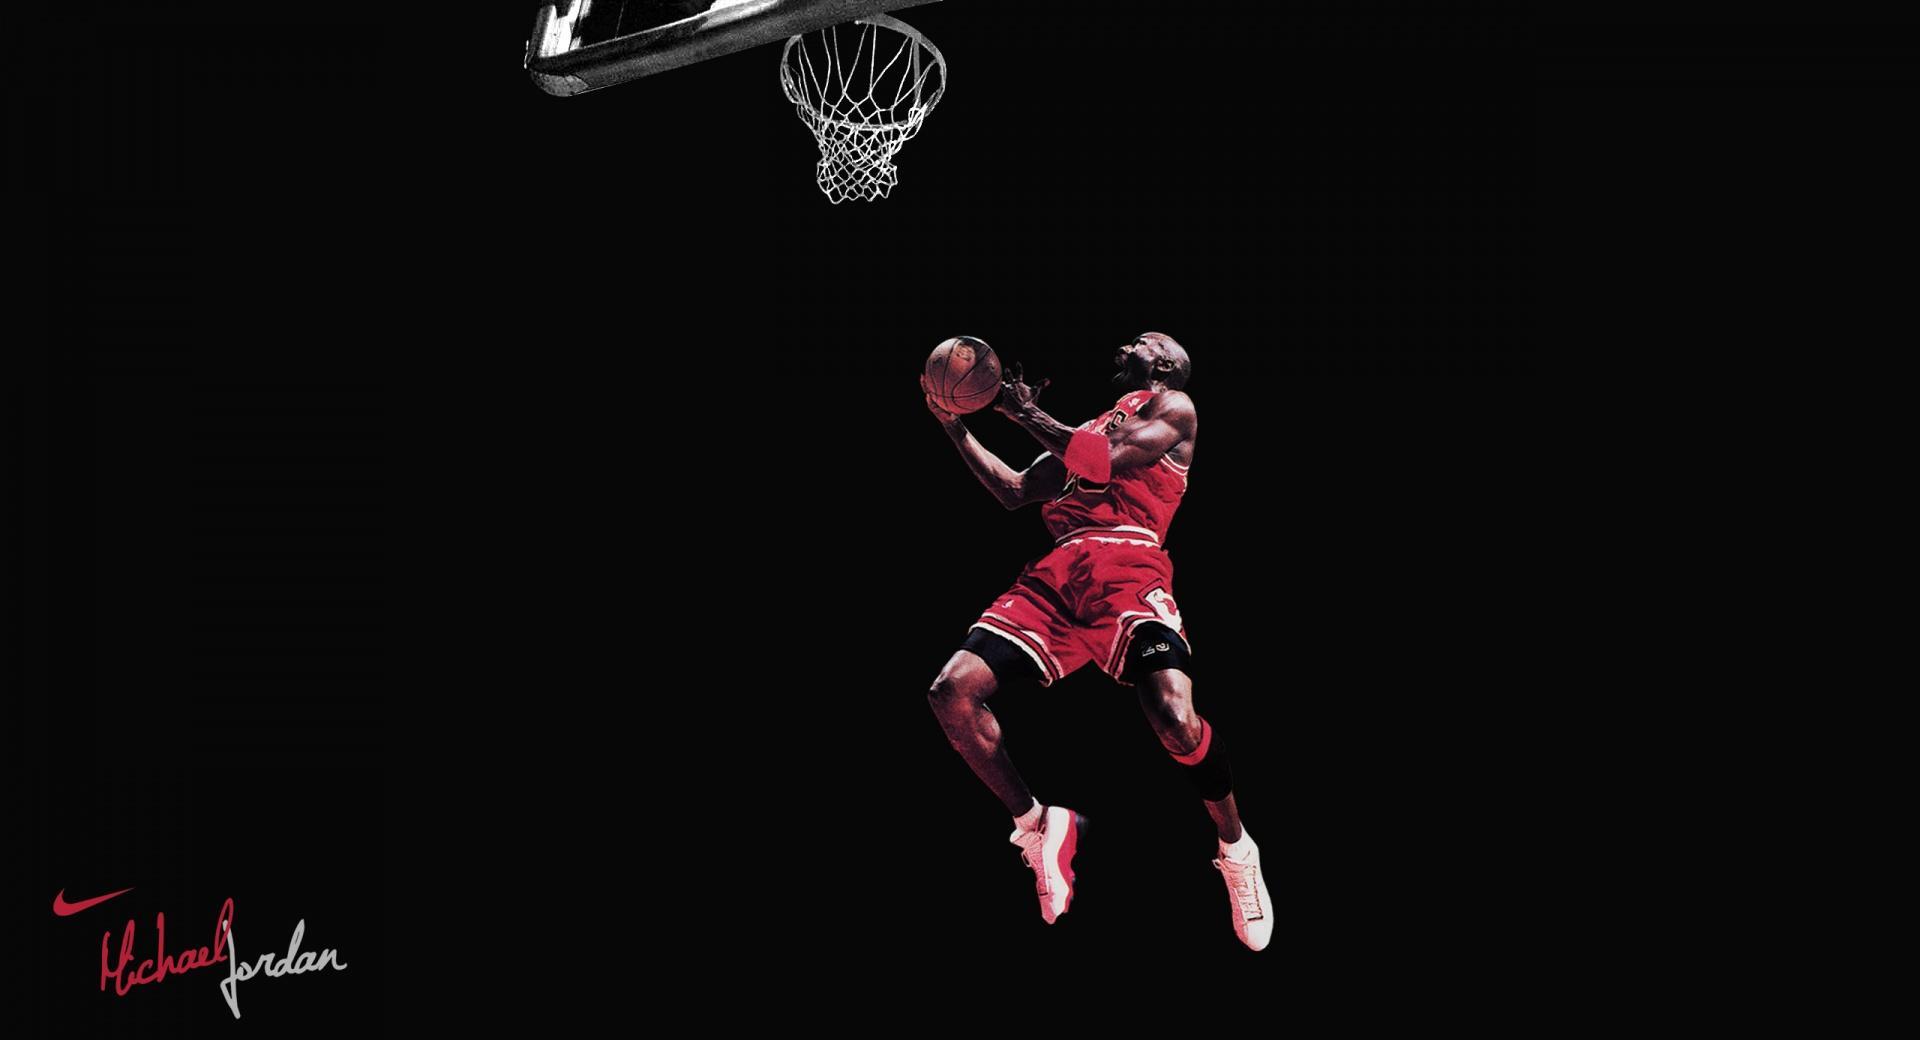 Michael Jordan Clean wallpapers HD quality